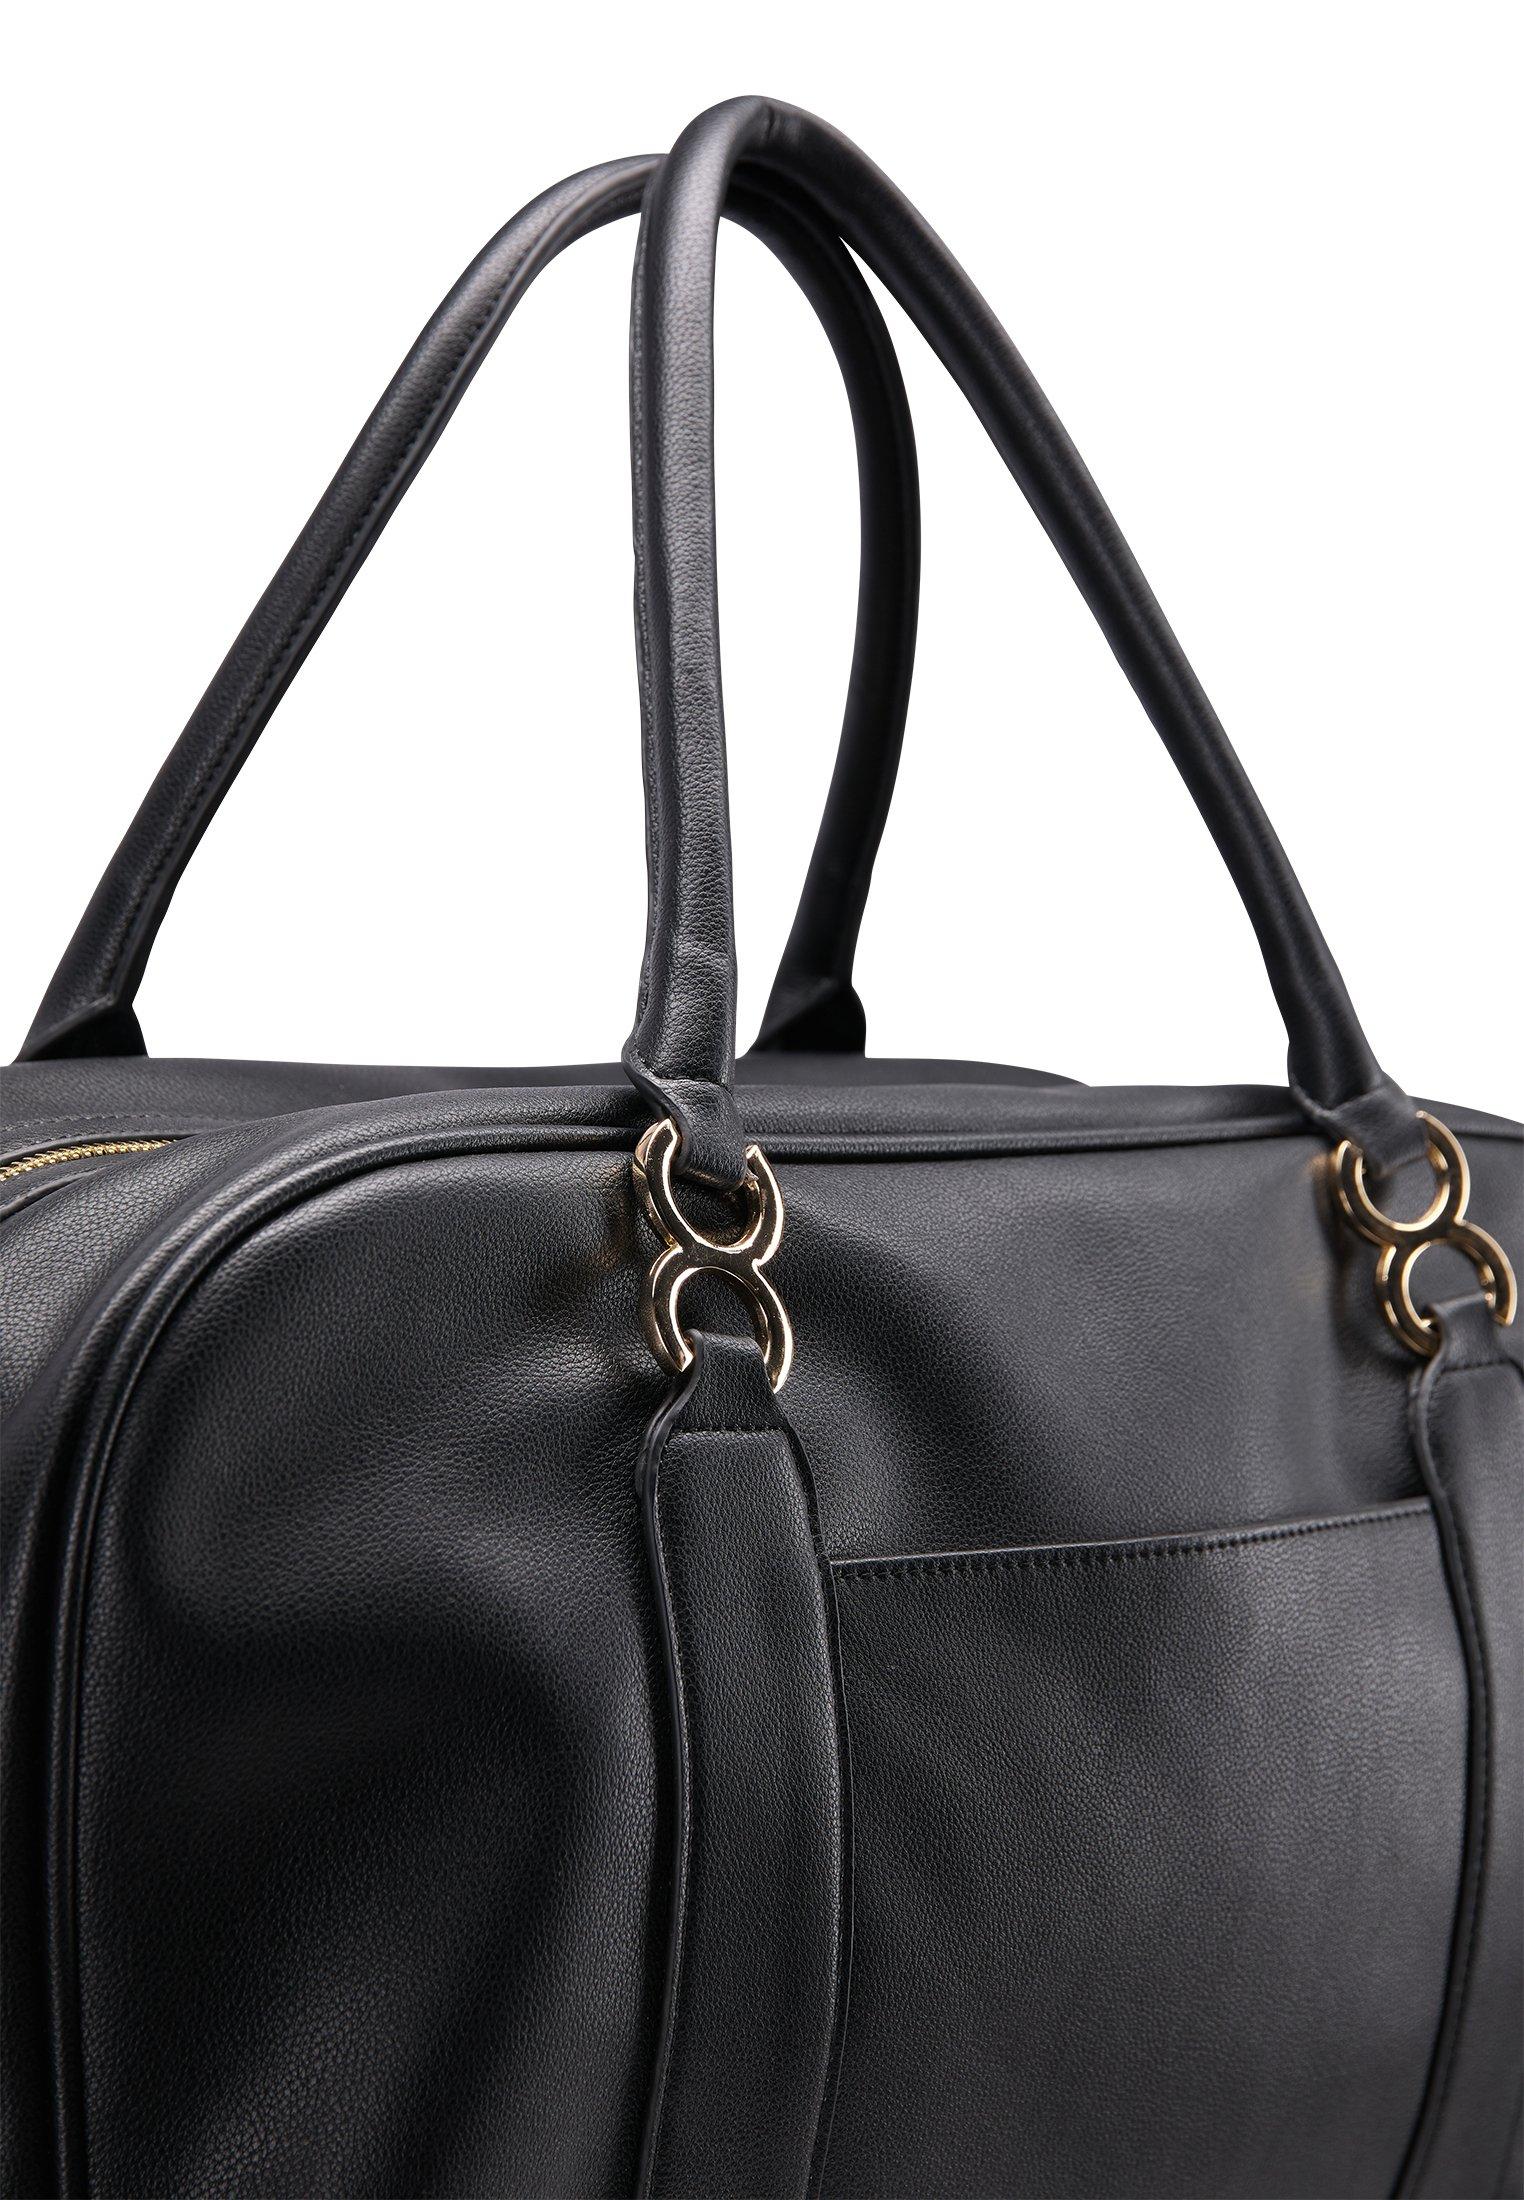 New Style Collections Accessories usha Weekend bag black De7ooMdHi gdGaLUmin